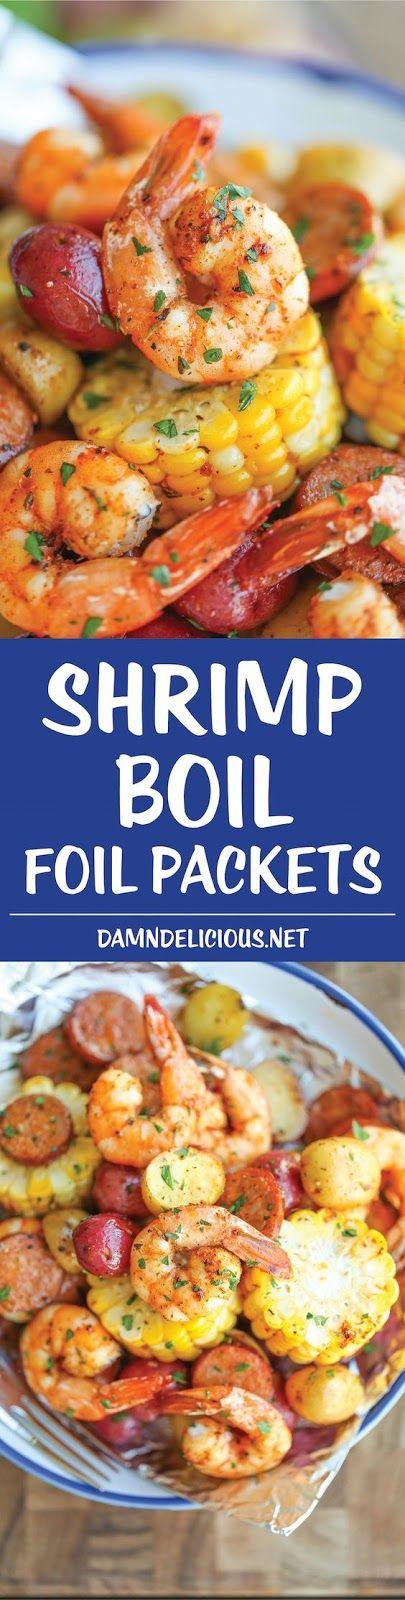 SHRIMP BOIL FOIL PACKETS | Cake And Food Recipe